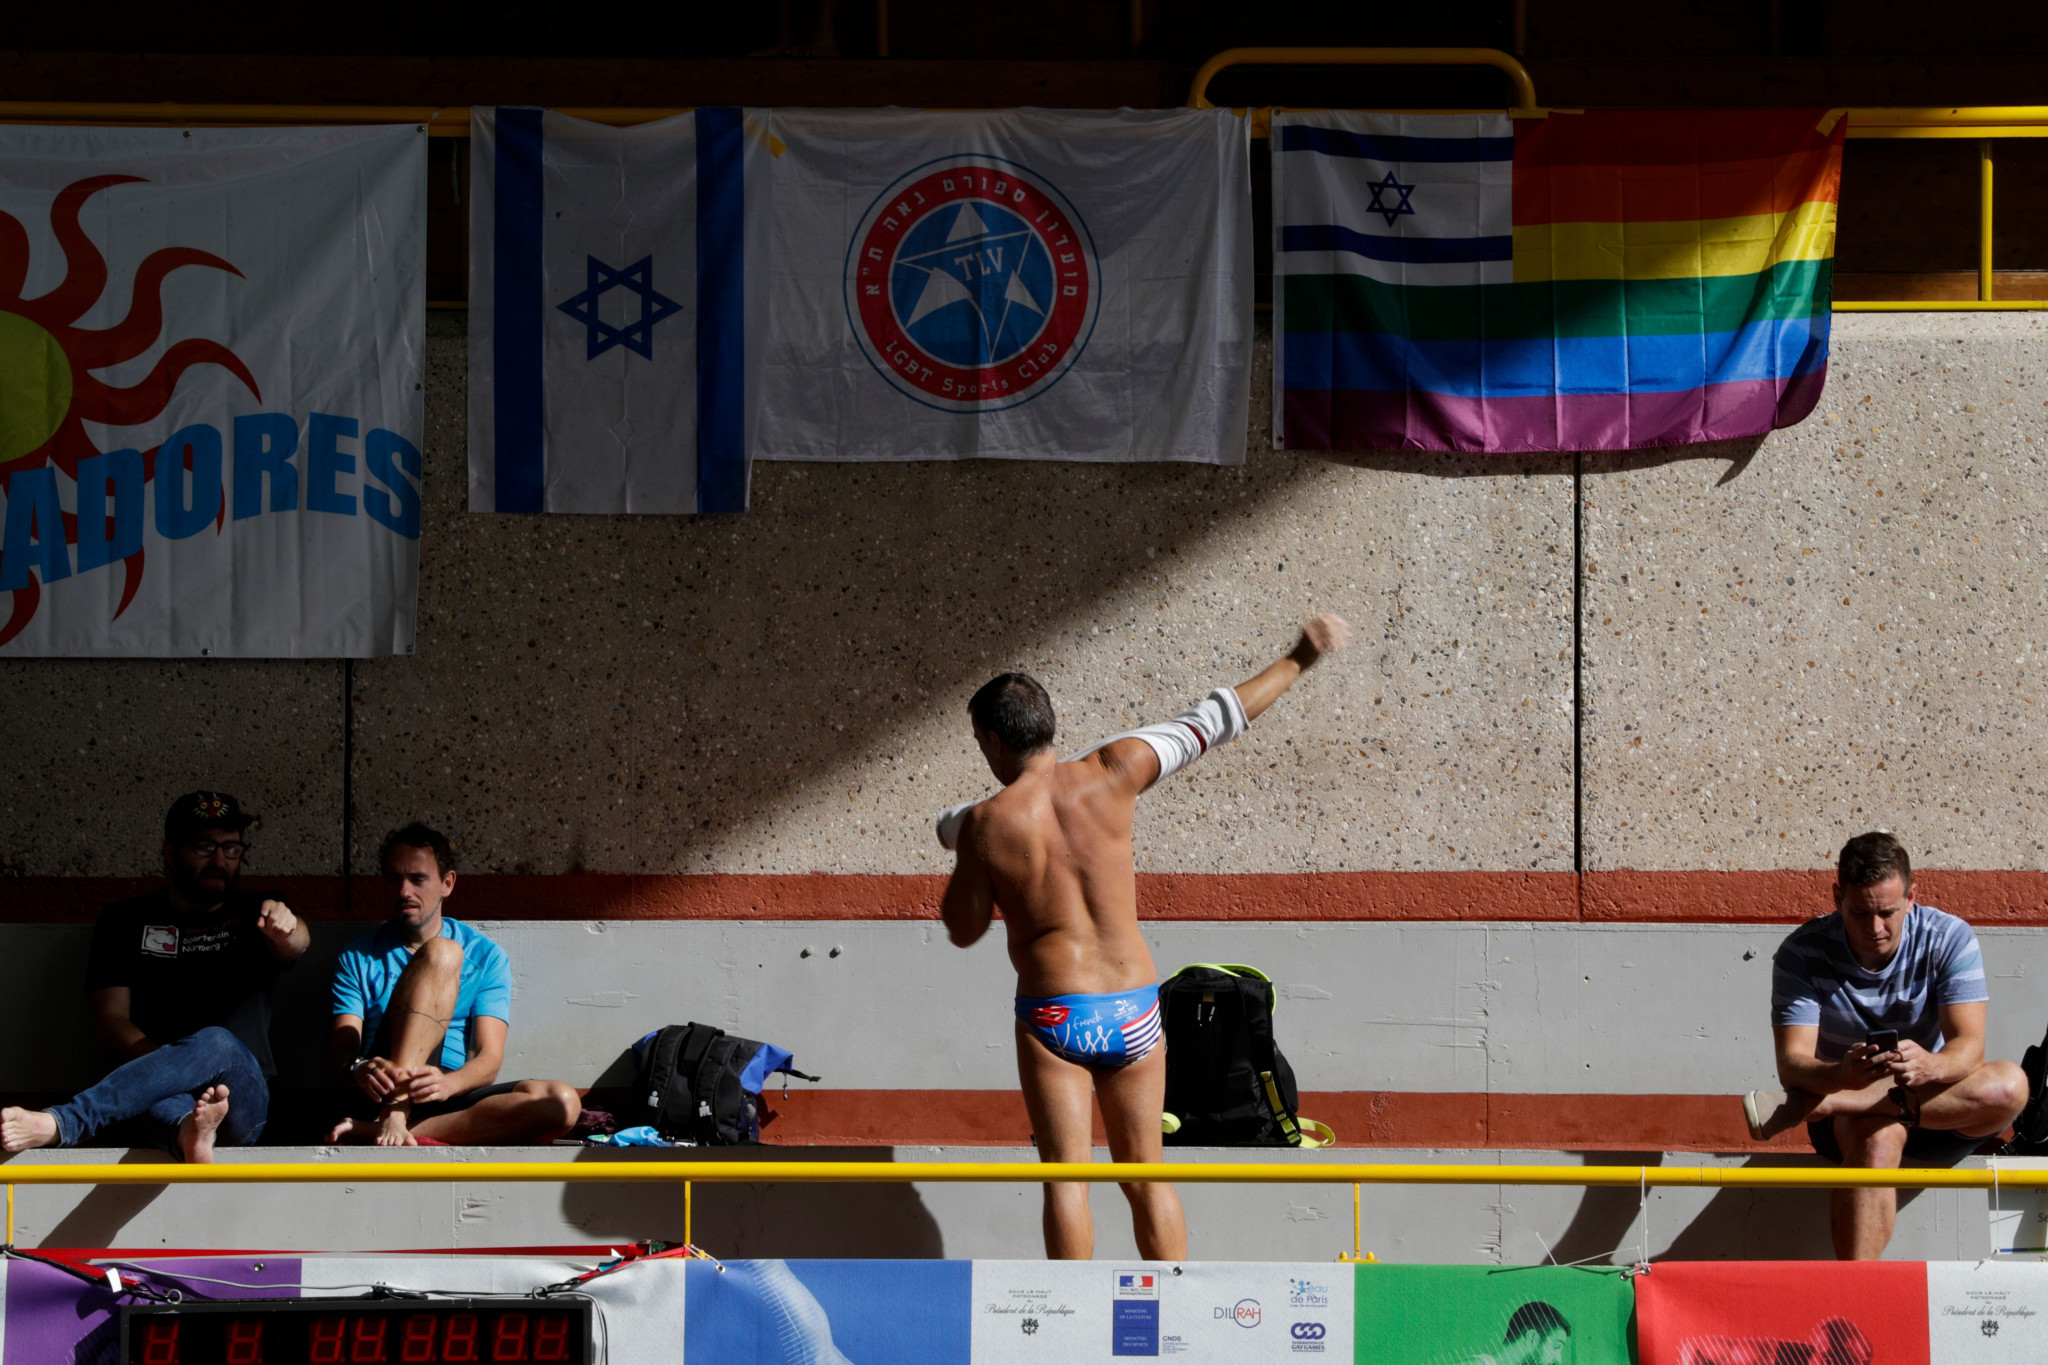 Twenty cities express interest in hosting 2026 Gay Games